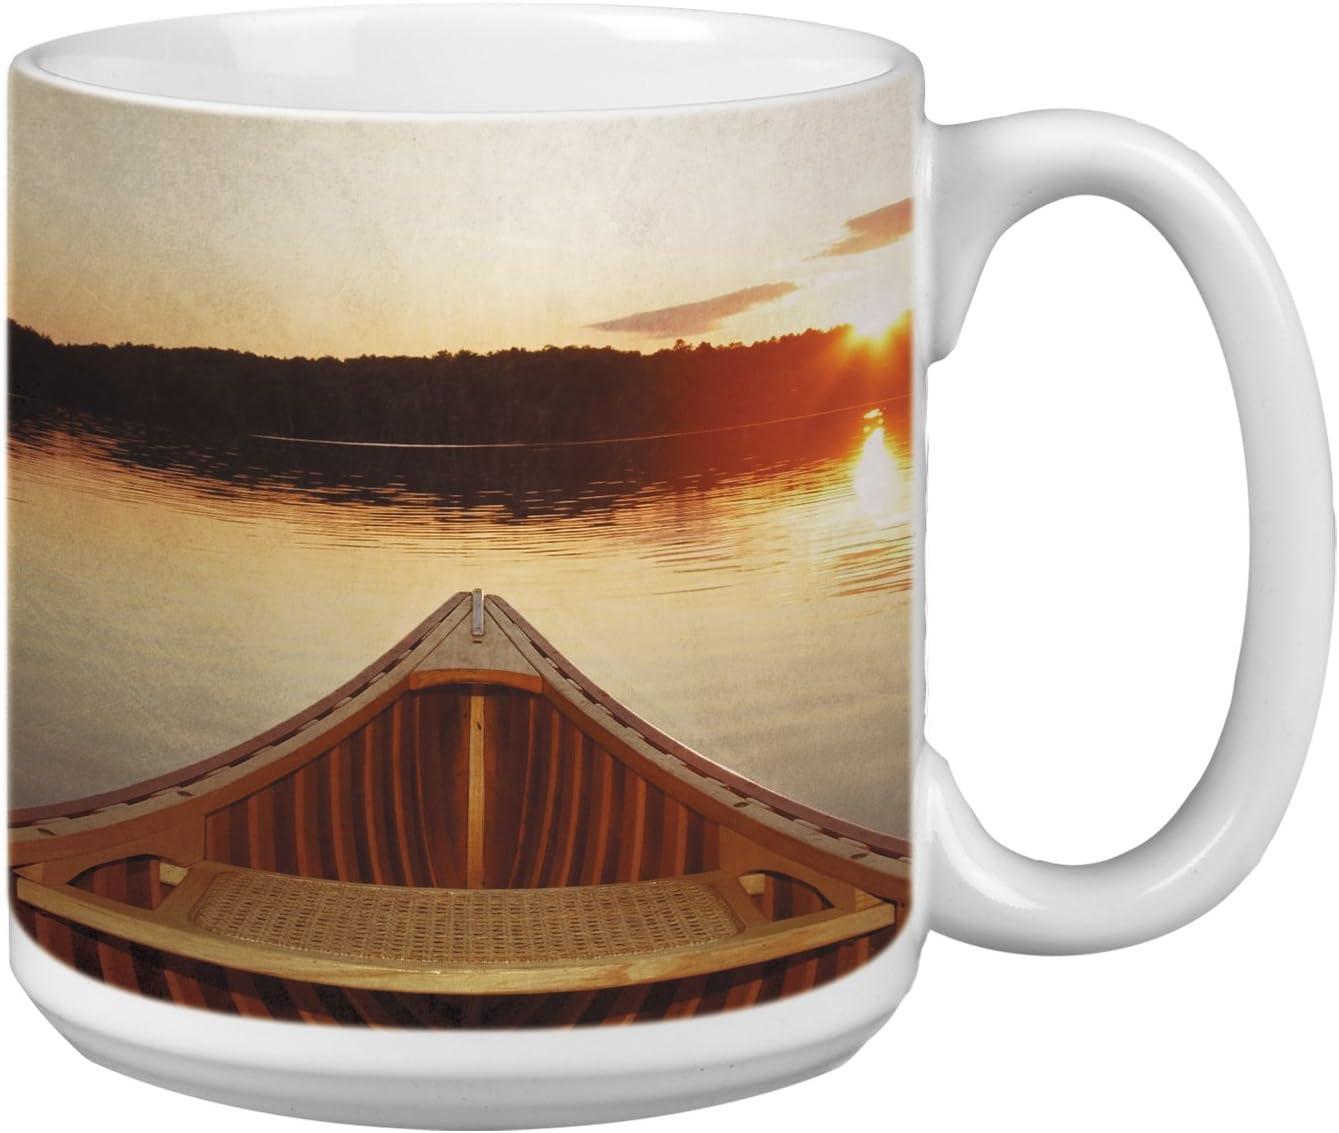 Serene Canoe Themed Outdoor Life Art Tree-Free Greetings Extra Large 20-Ounce Ceramic Coffee Mug XM63111